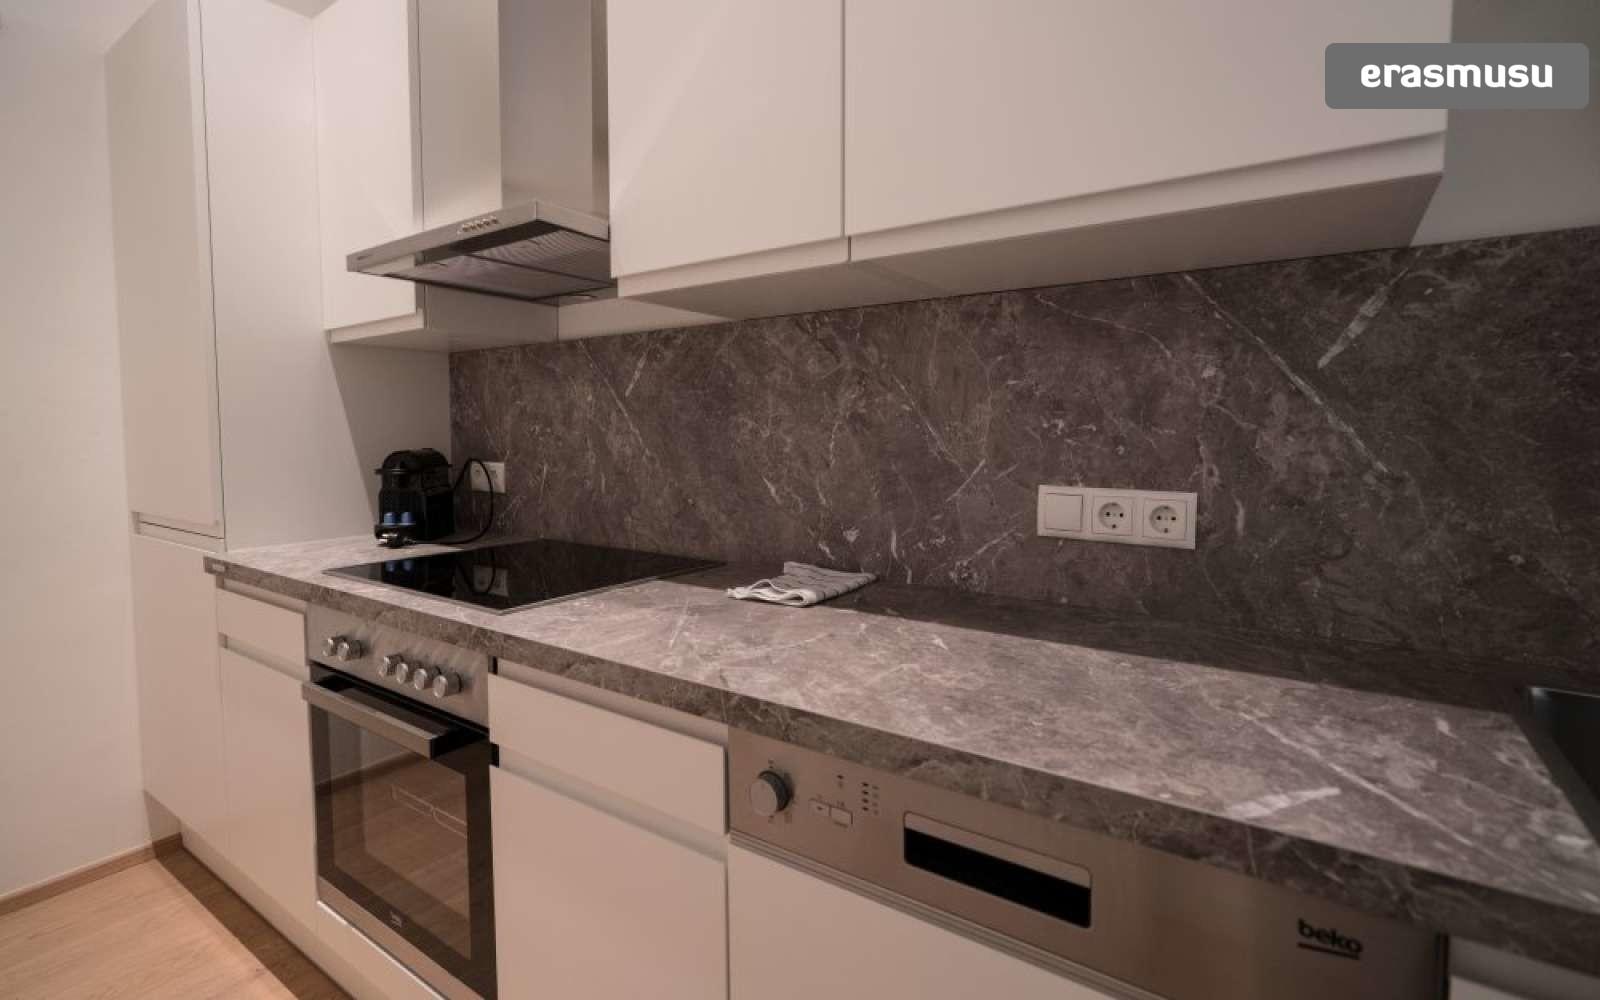 studio-apartment-rent-landstrase-aac8d02e07a7798a1e260b5fae0d9ae